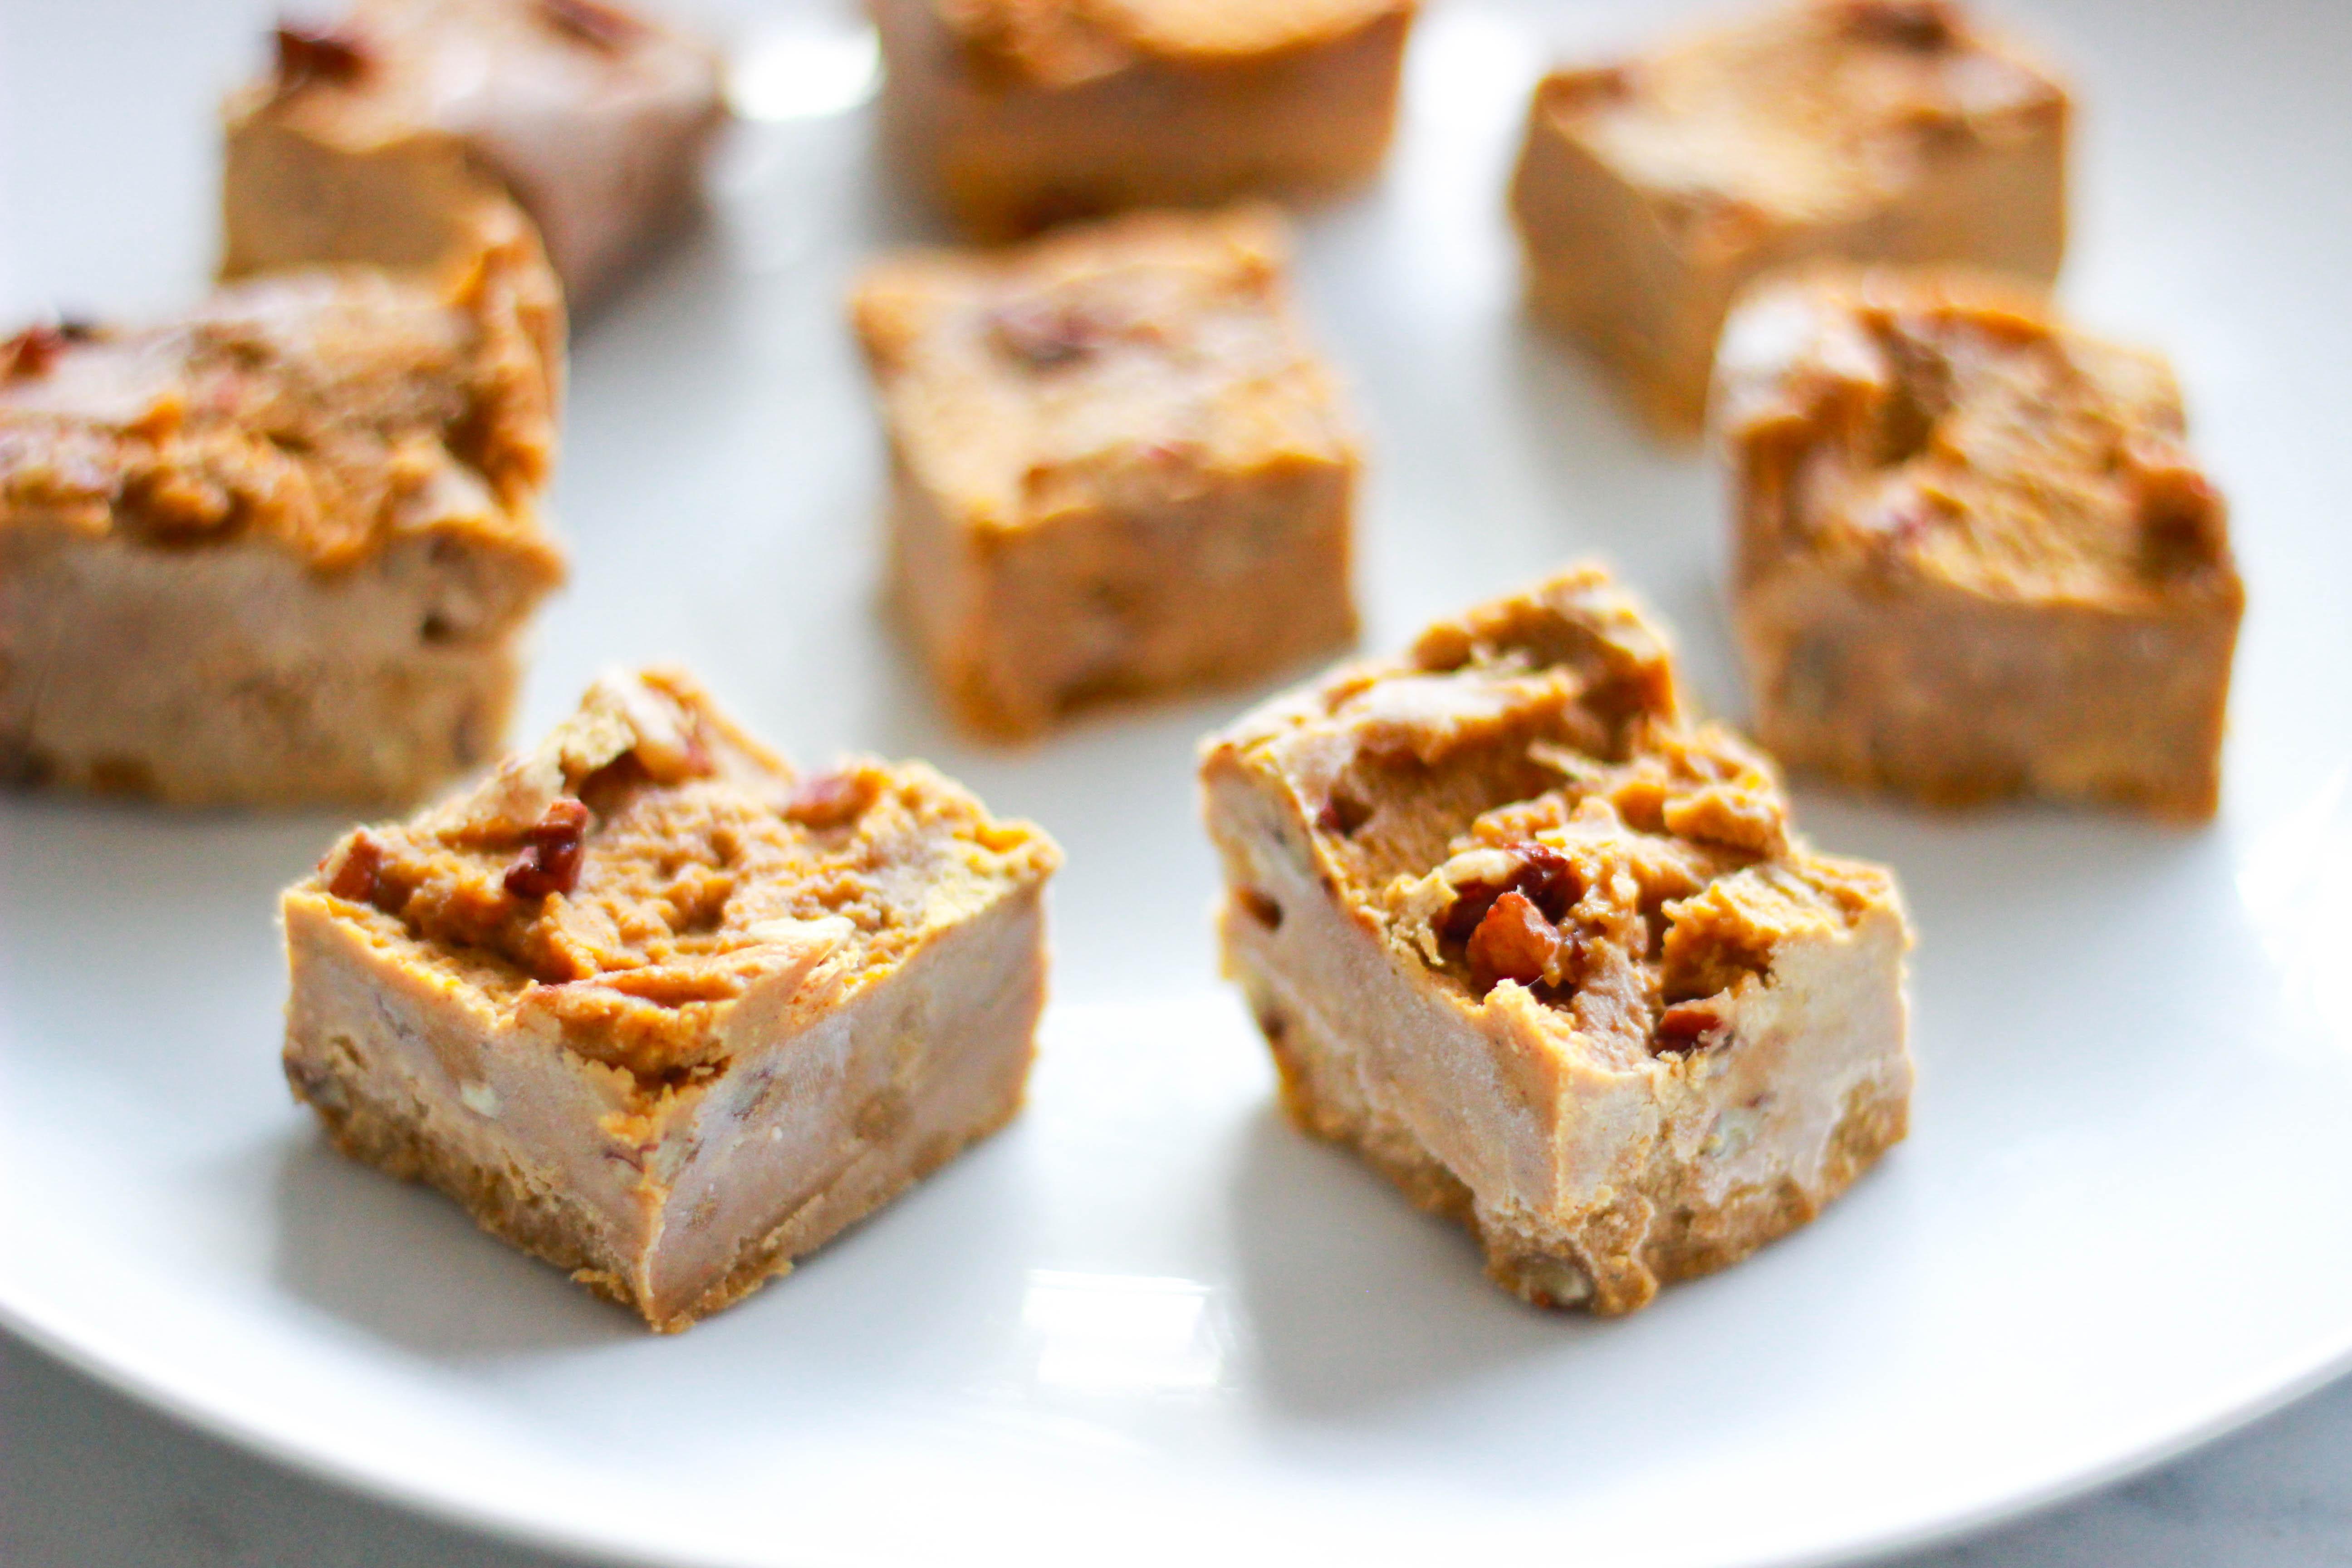 Sugar-Free Pumpkin Fudge (Paleo / Vegan)